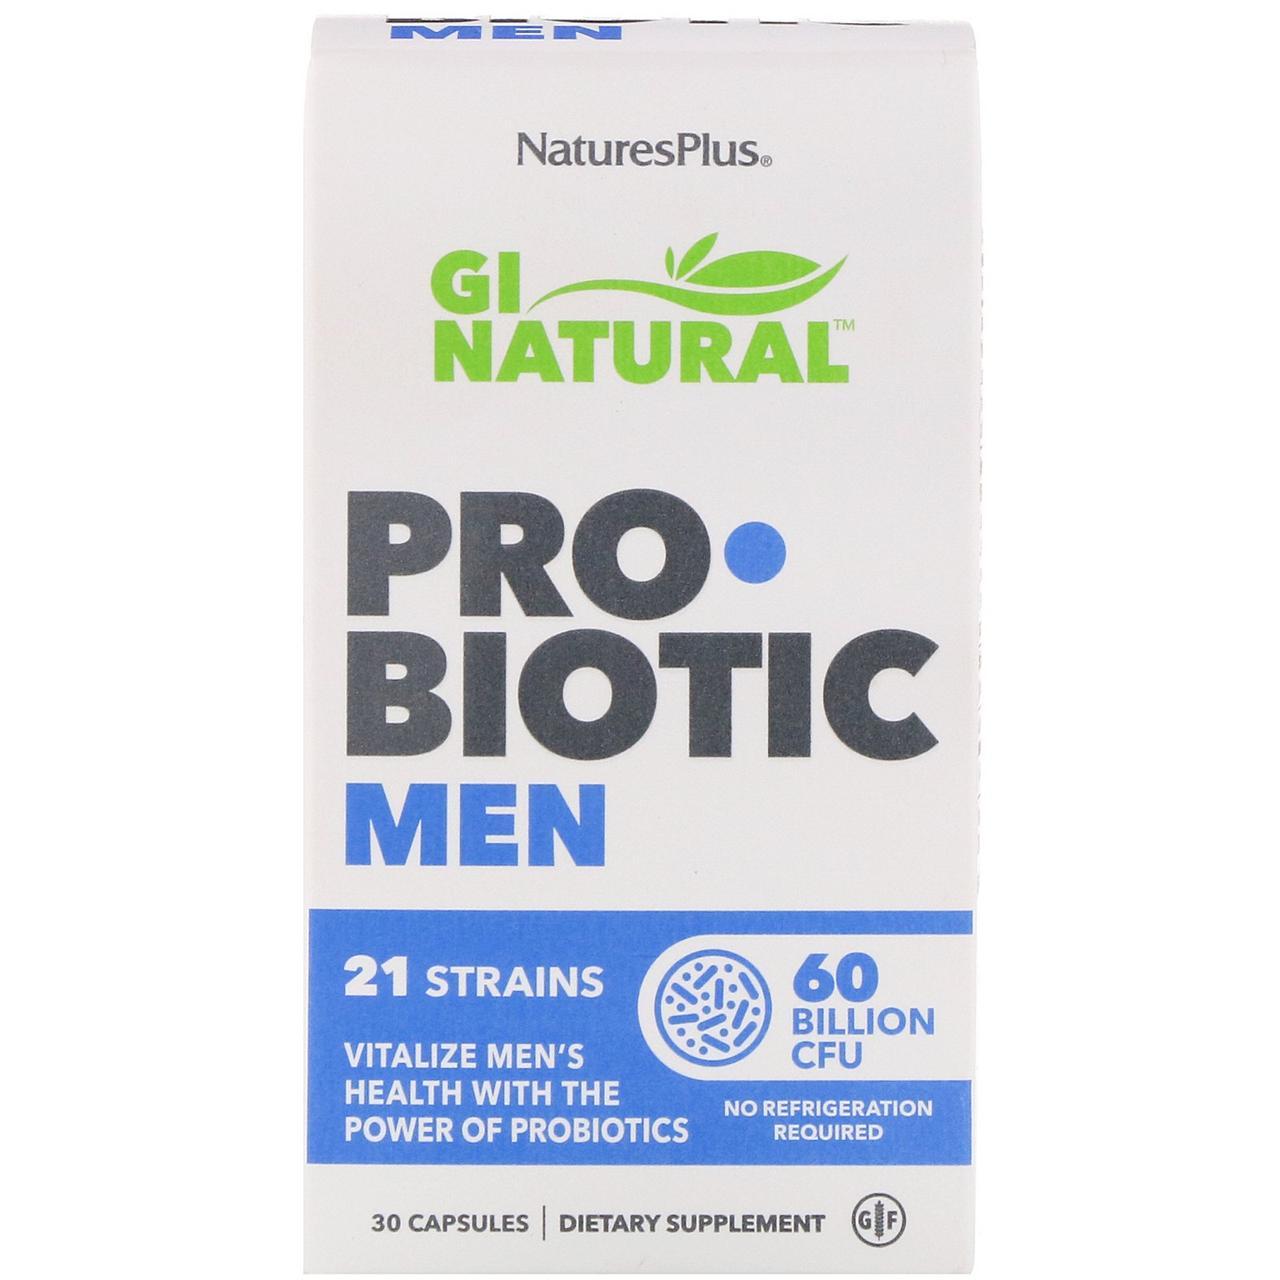 "Пробиотики для мужчин ""GI Natural"" от Nature's Plus, 60 миллиардов КОЕ, 30 капсул"